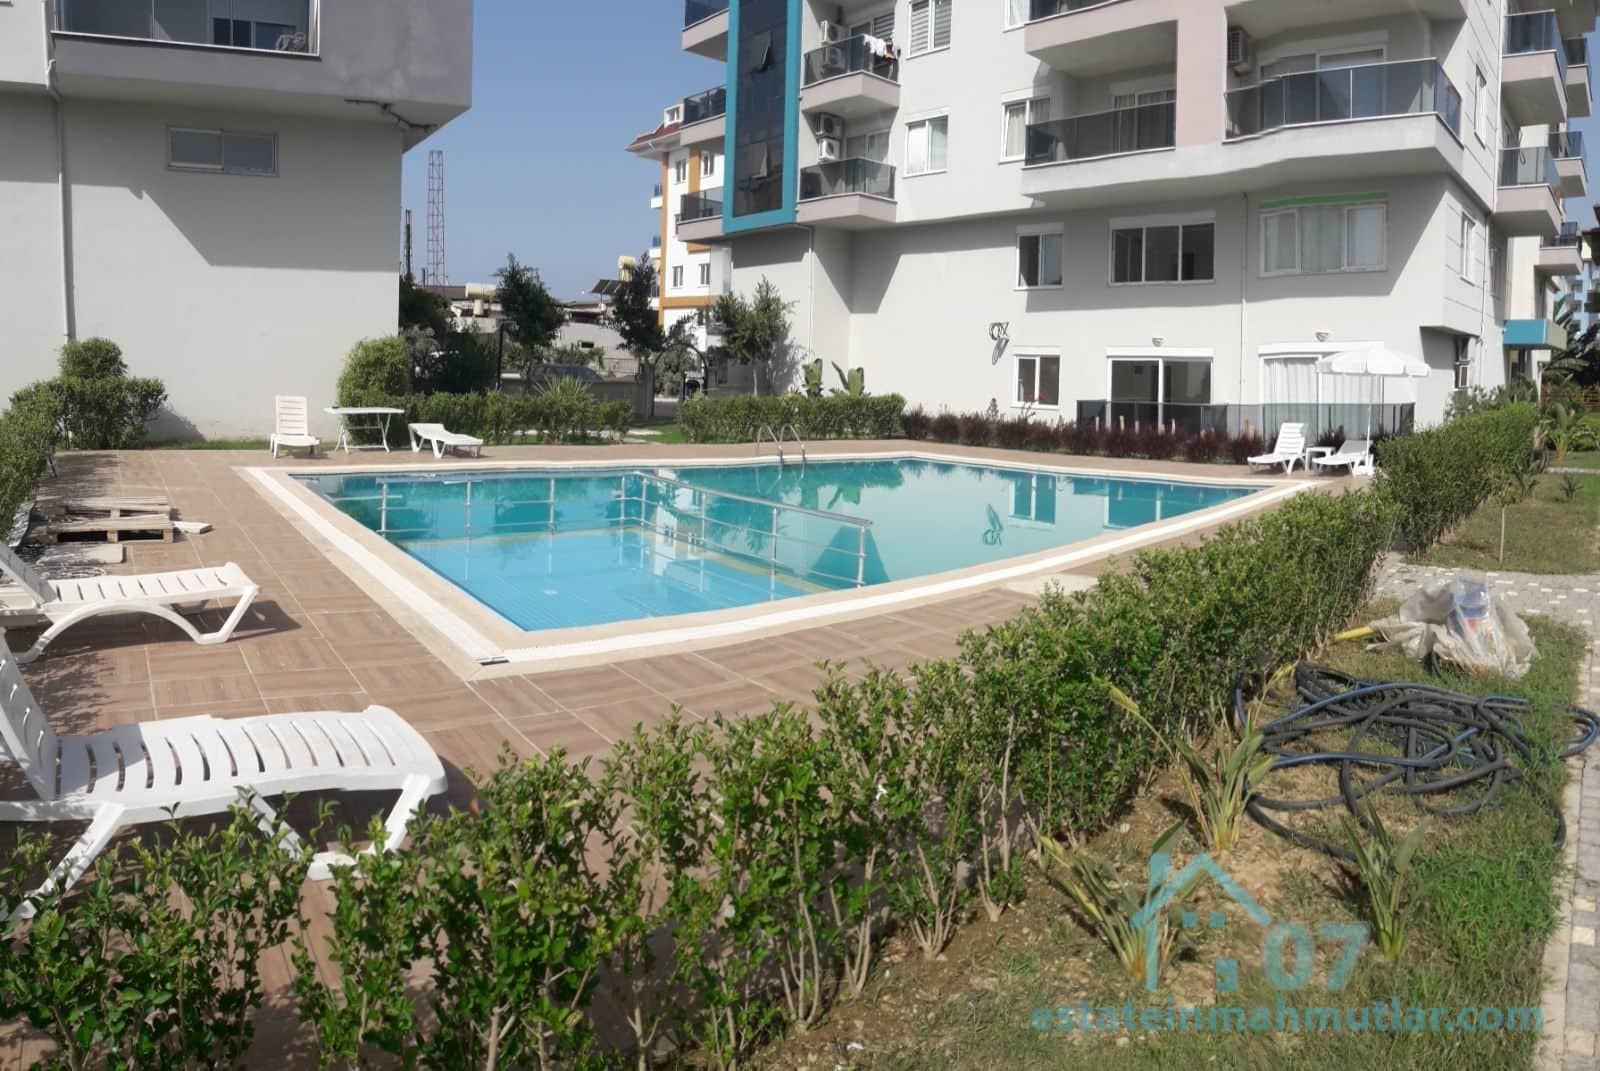 Newly built Luxury Bachelor Apt in the Kestel Region of Alanya, Antalya